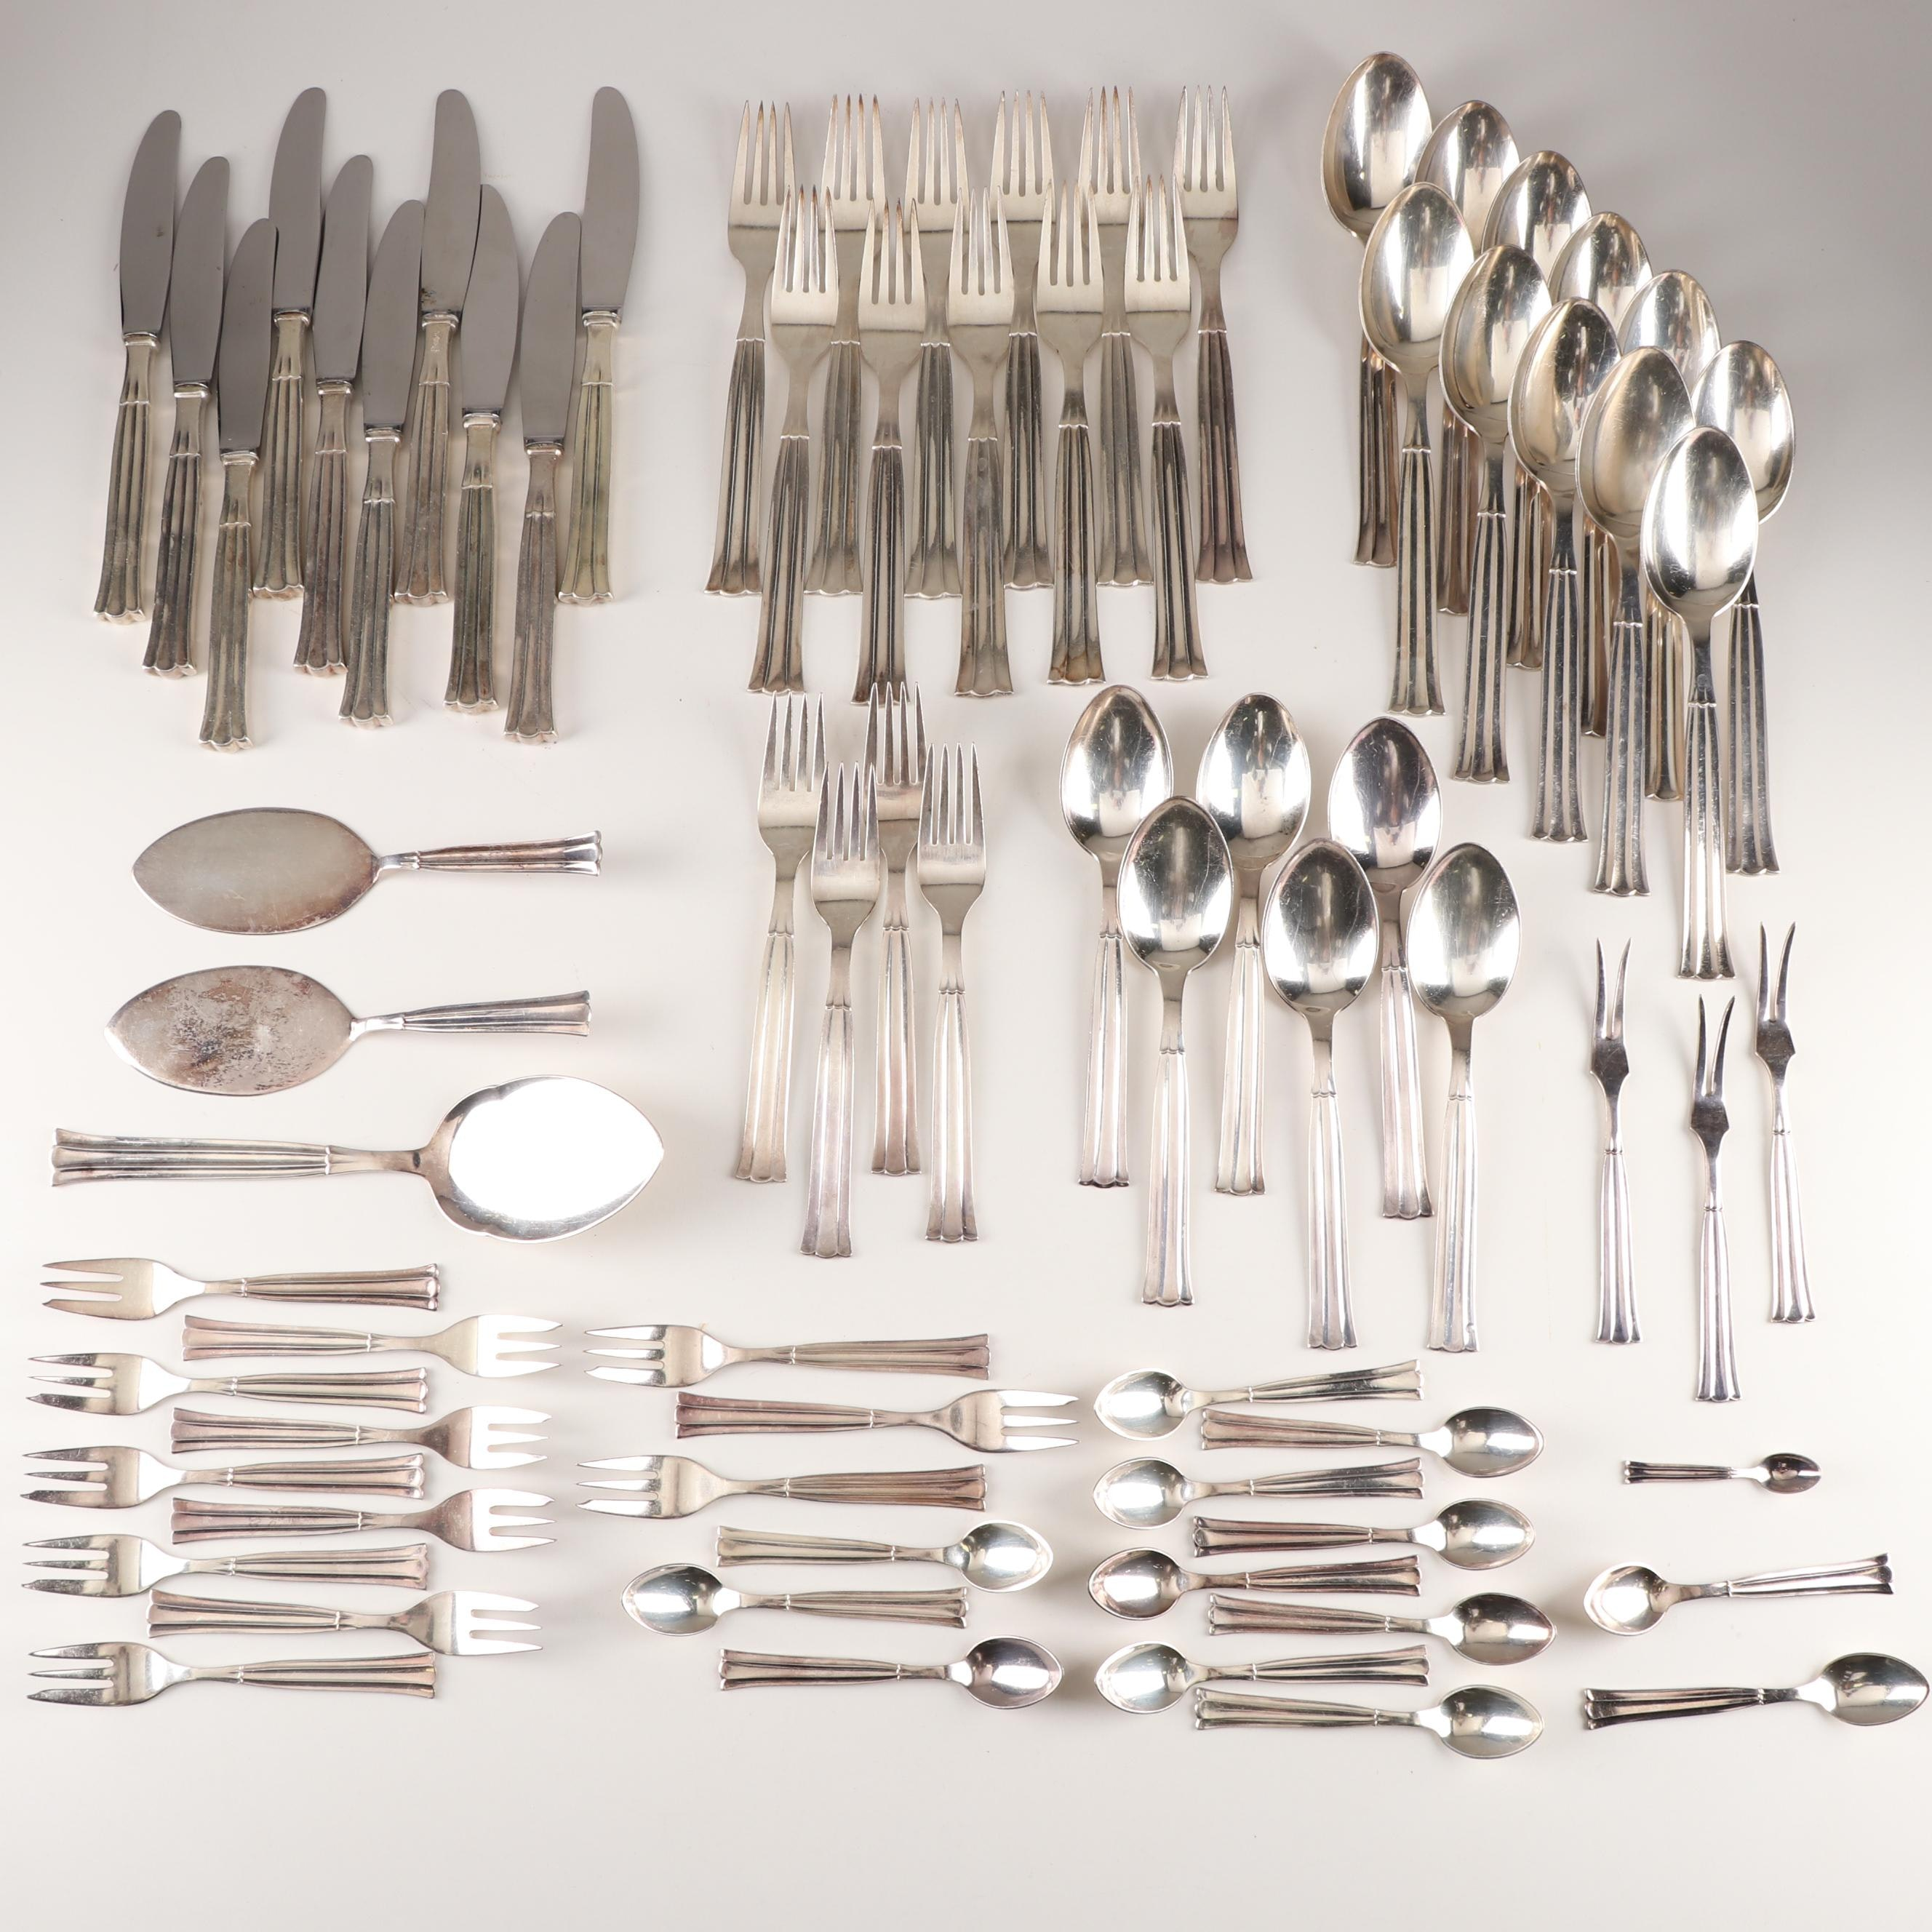 Victoria Silver Plated Flatware Set